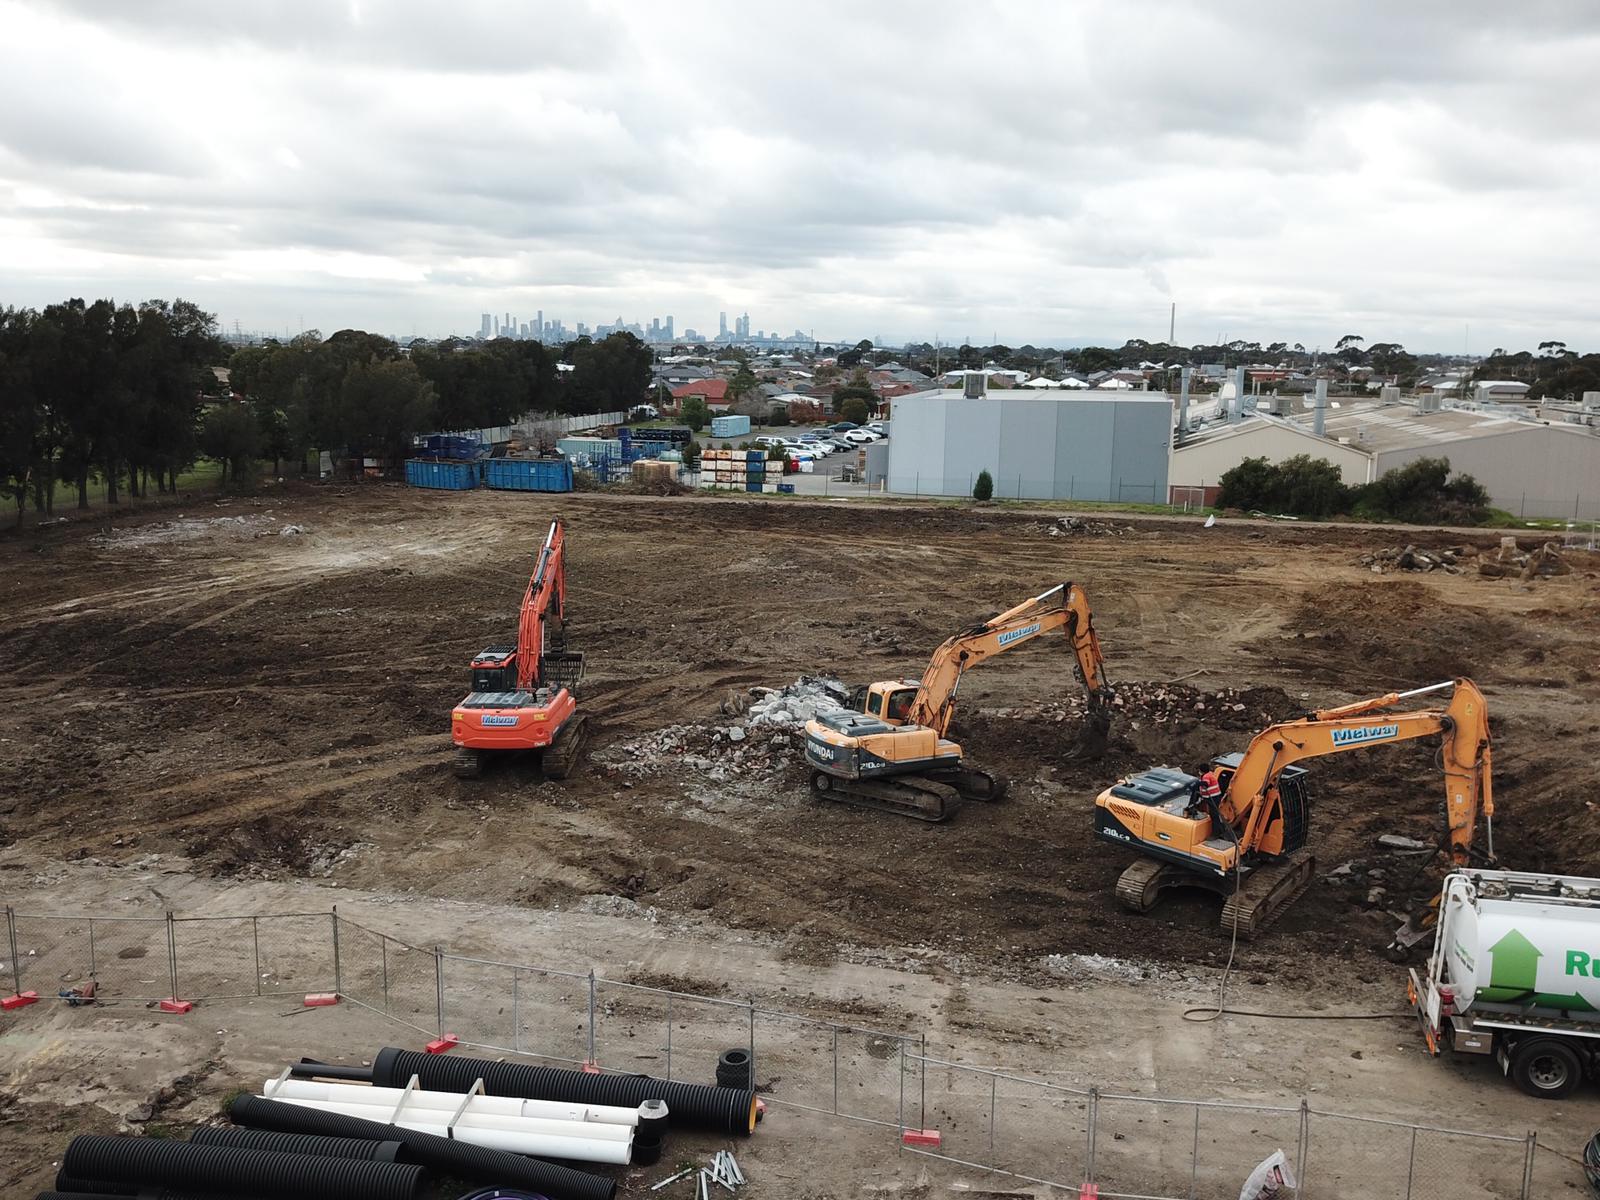 Full Commercial Demolition